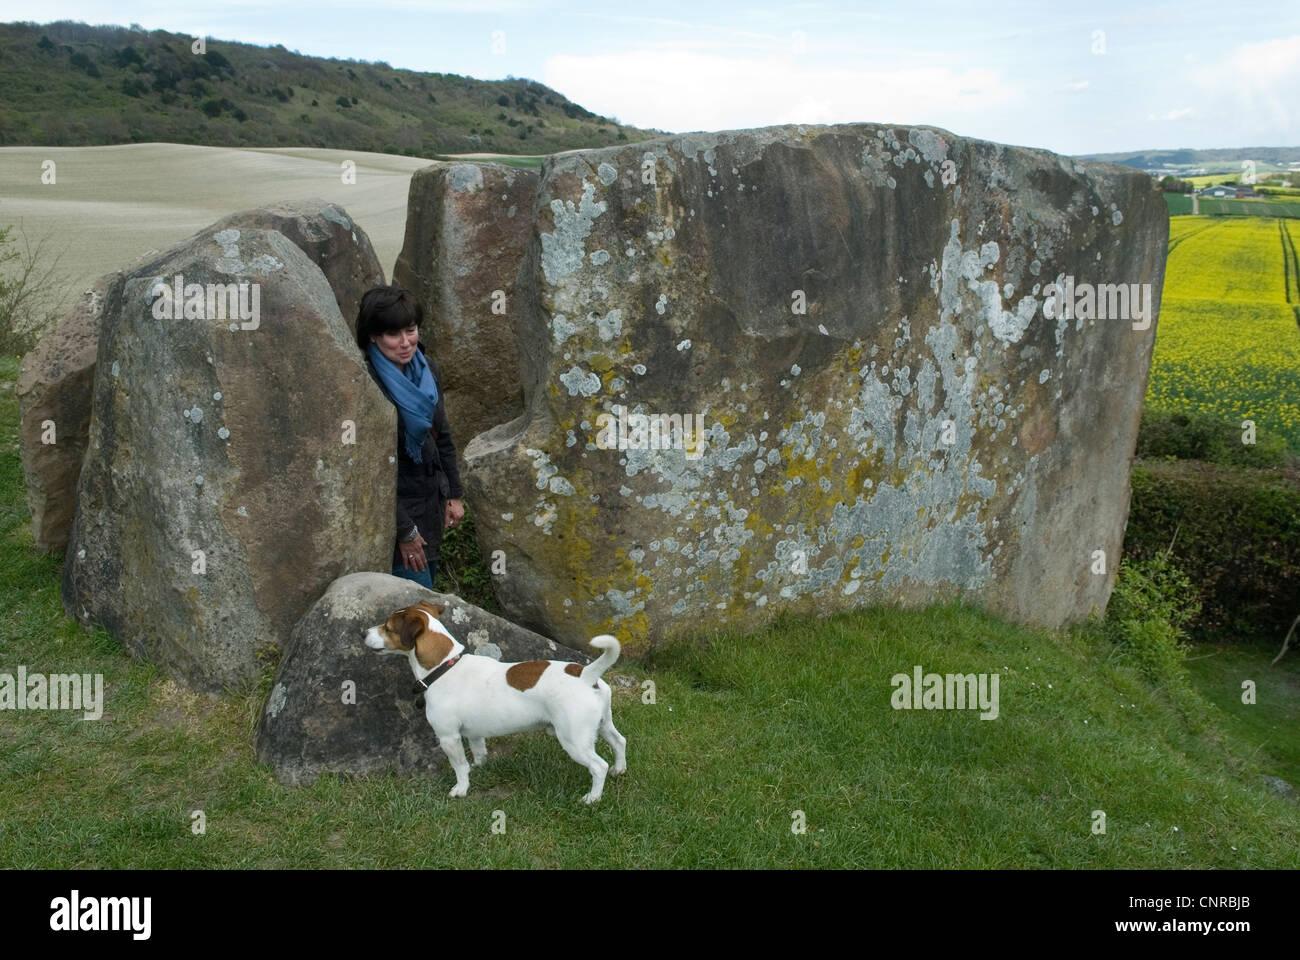 Piedra Coldrum Long Barrow Kent Downs, Reino Unido. HOMER SYKES Imagen De Stock